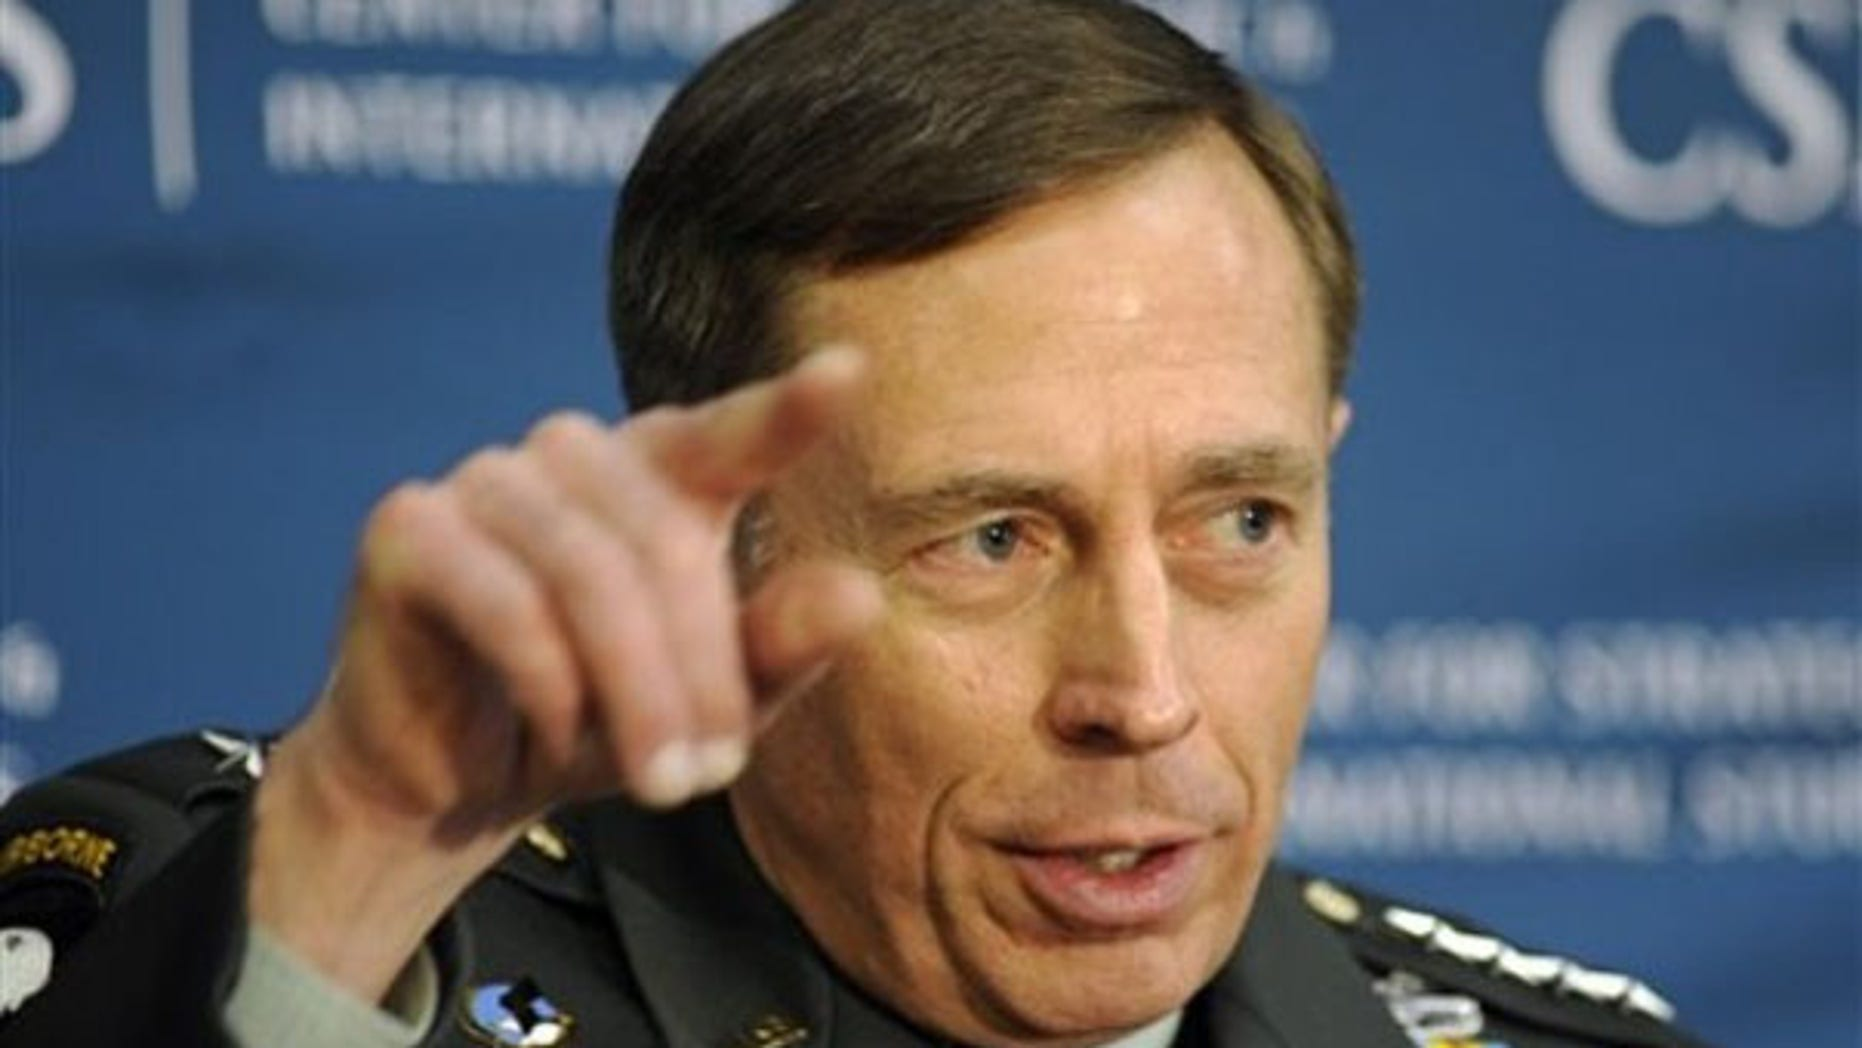 Gen. David Petraeus addresses the Center for Strategic and International Studies in Washington Jan. 21. (AP Photo)